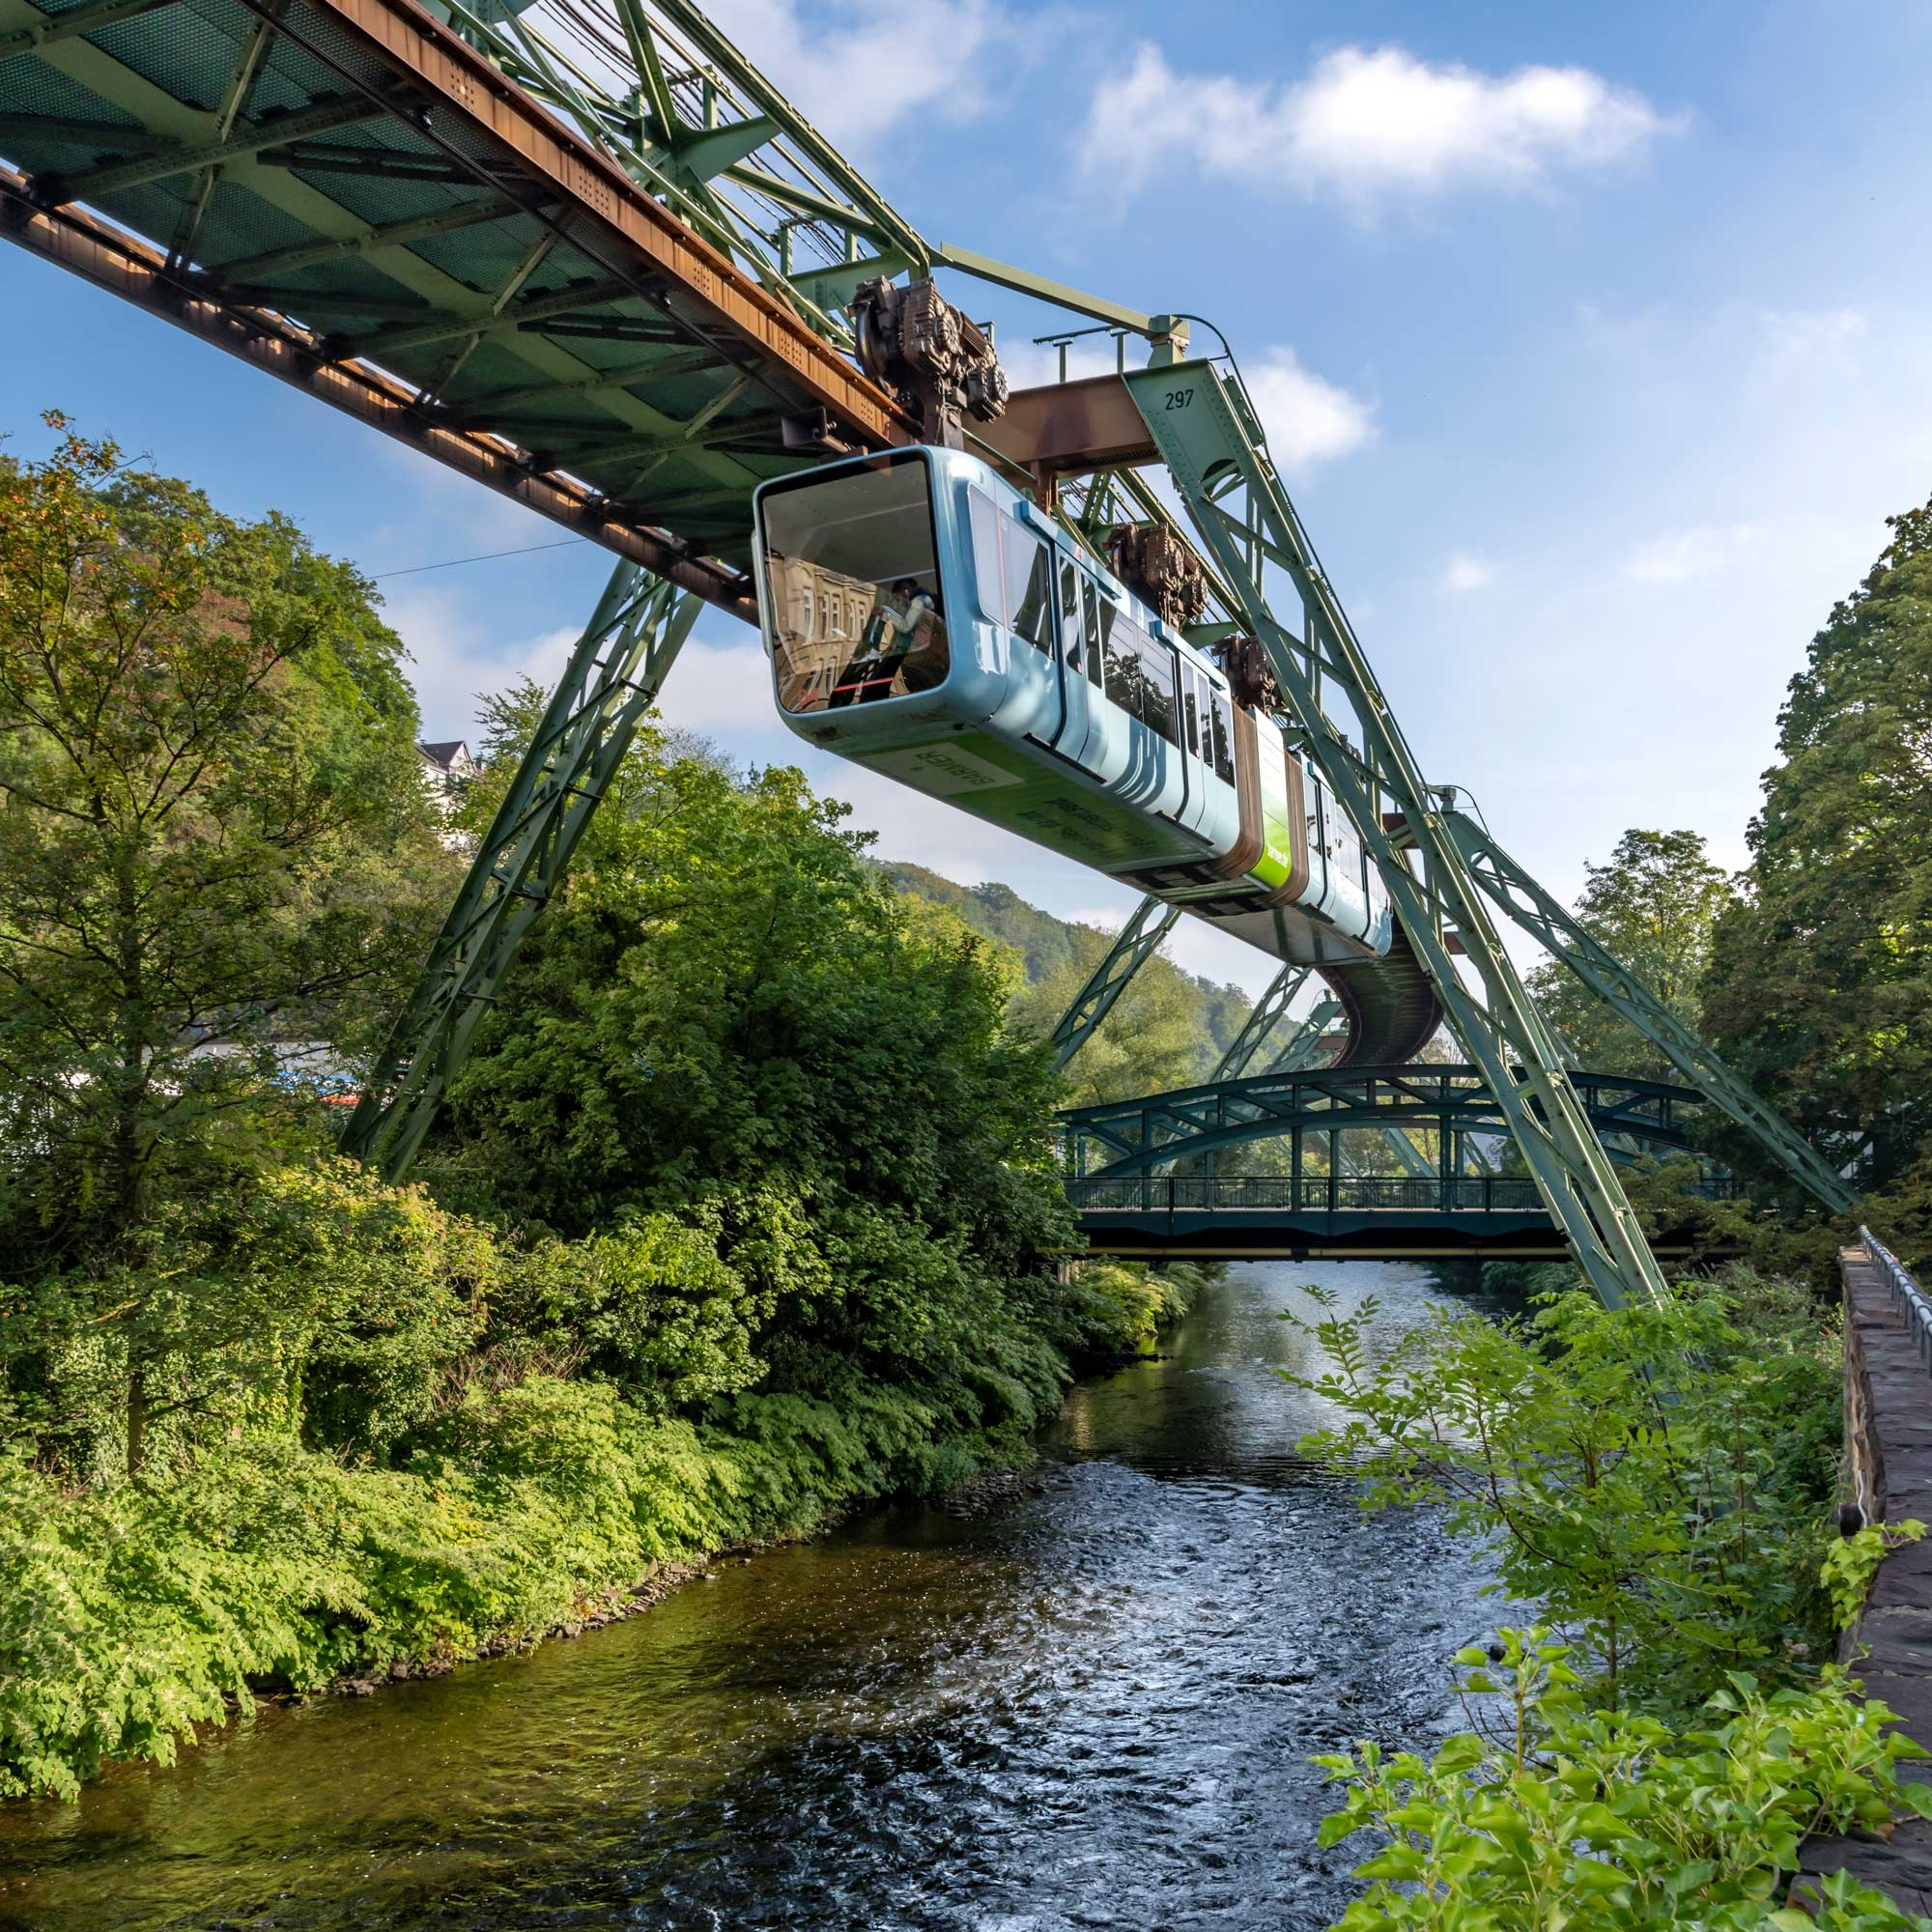 Wuppertal Schwebebahn Monorail, Germany 190906wc859754-2